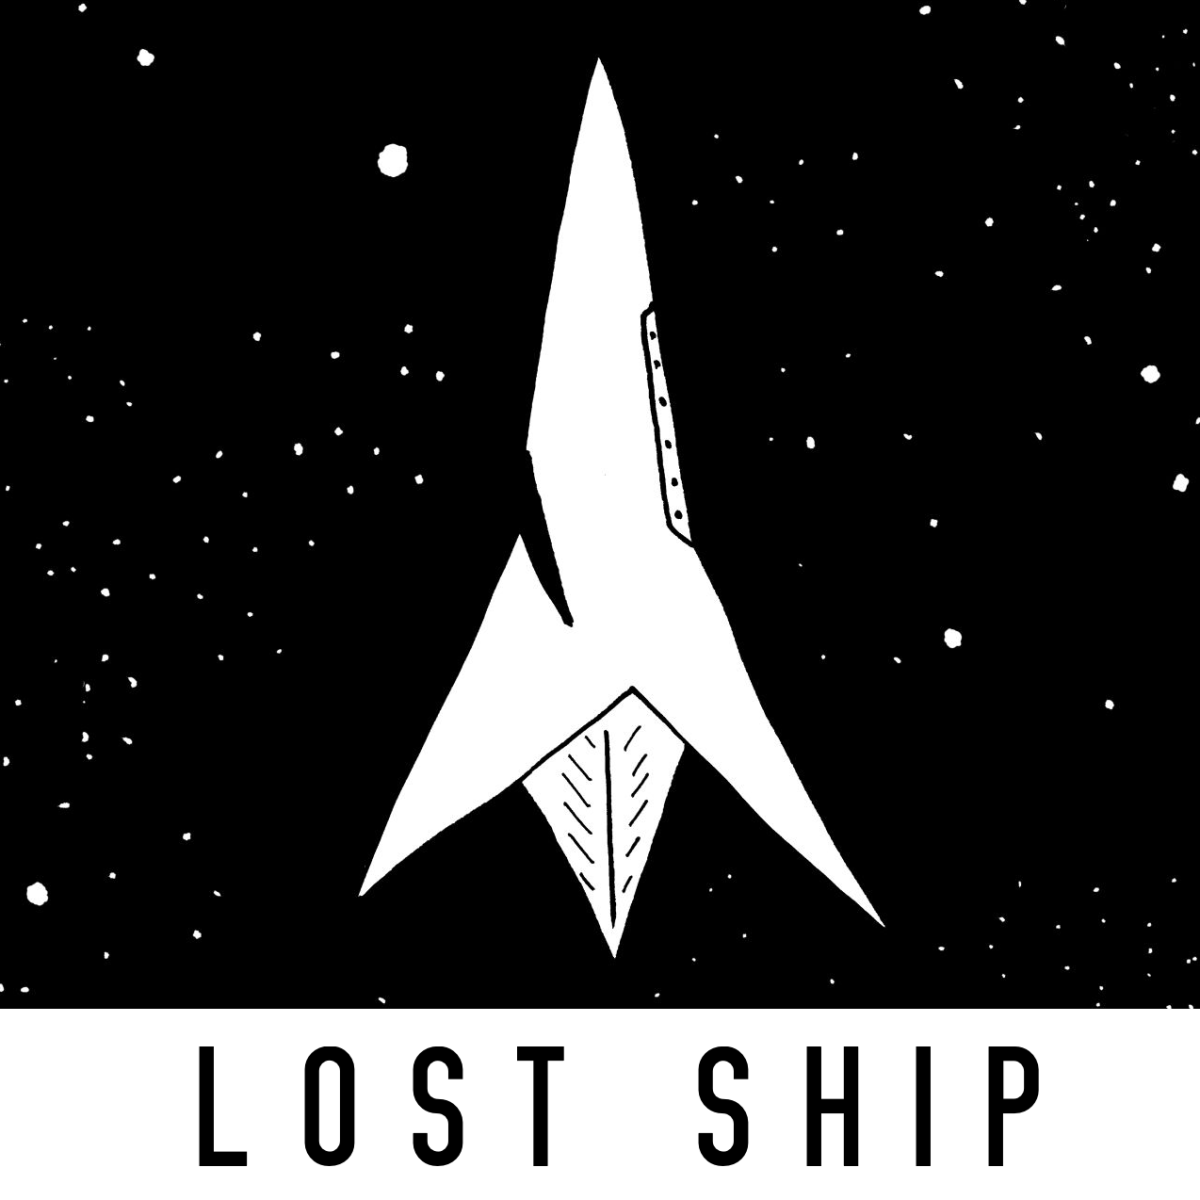 Launching Lost Ship